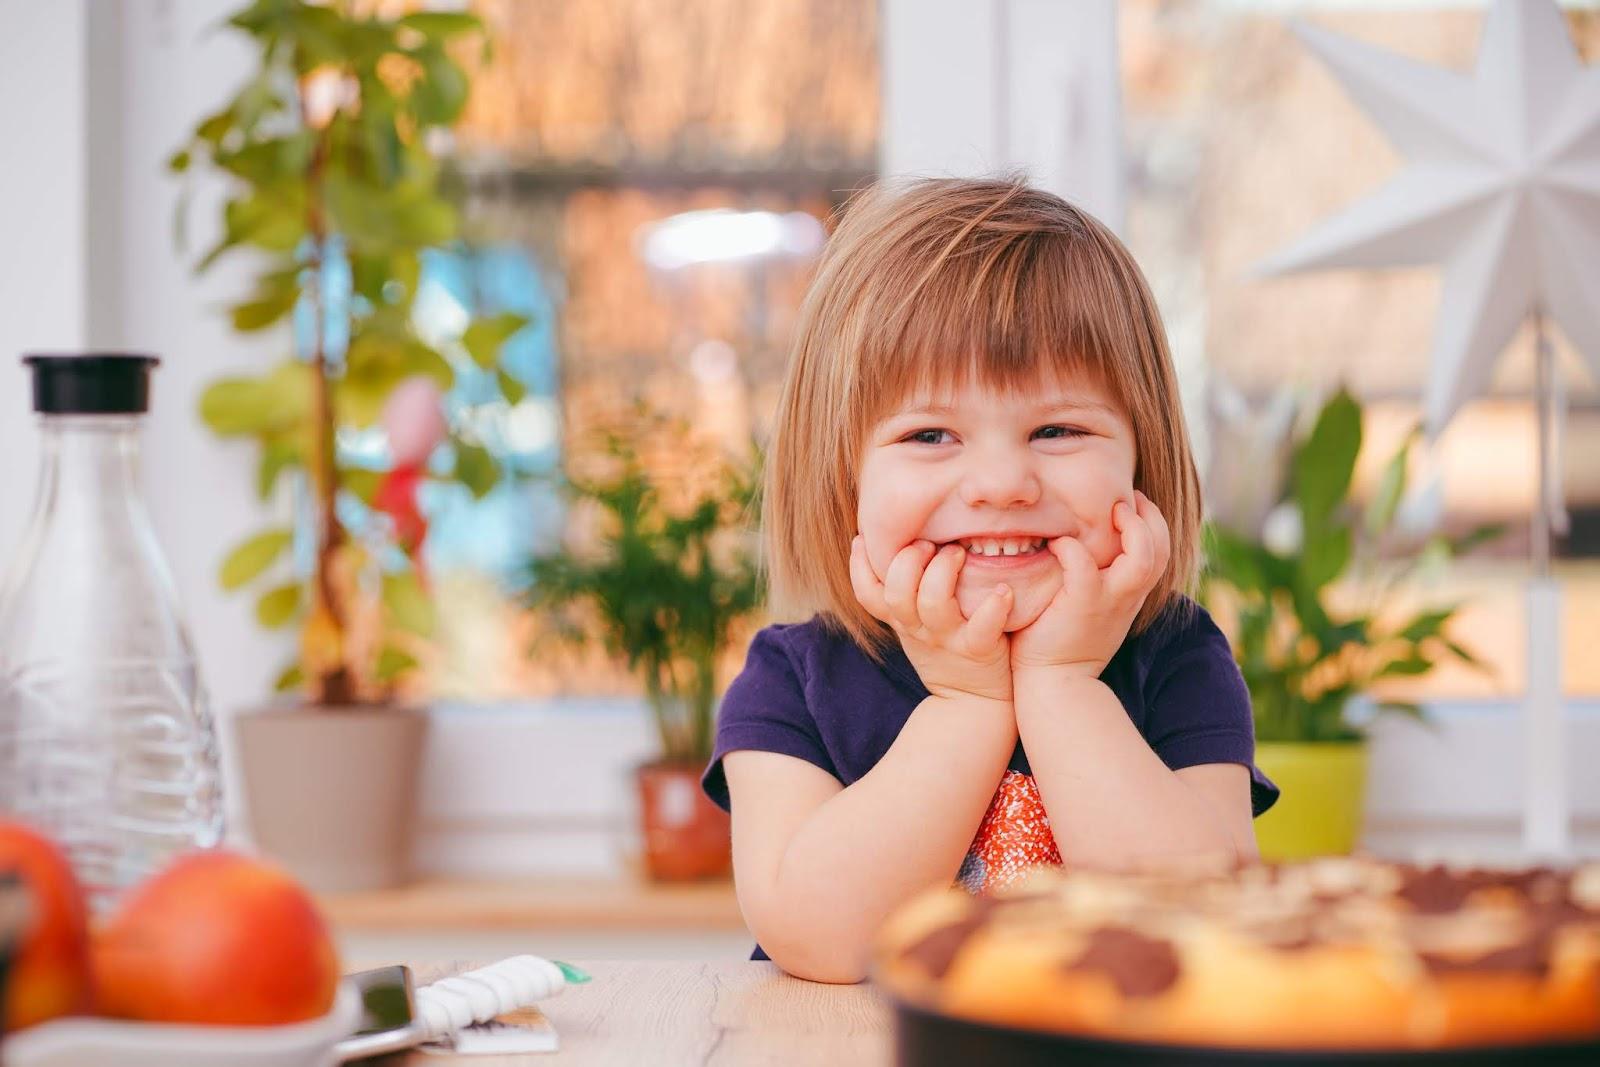 NAMC Montessori cosmic education and world food day. Girl eating.